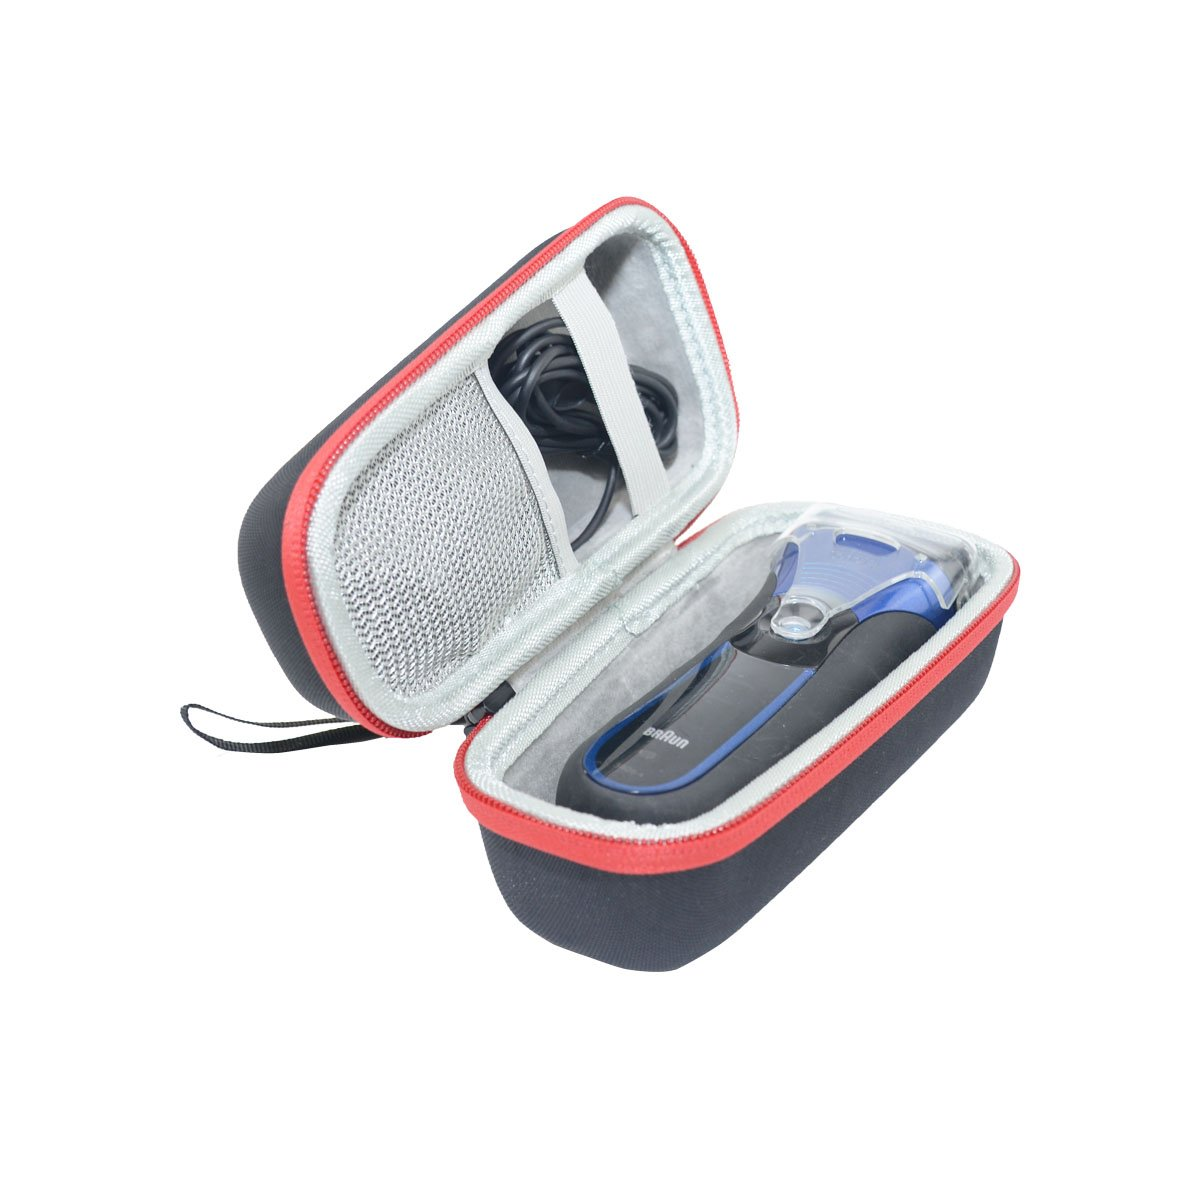 for Braun Series 3 ProSkin 3040s 3010BT 3010s 300s 310s 3000s Men Wet and Dry Electric Shaver/Razor Hard Travel Case Bag by SANVSEN